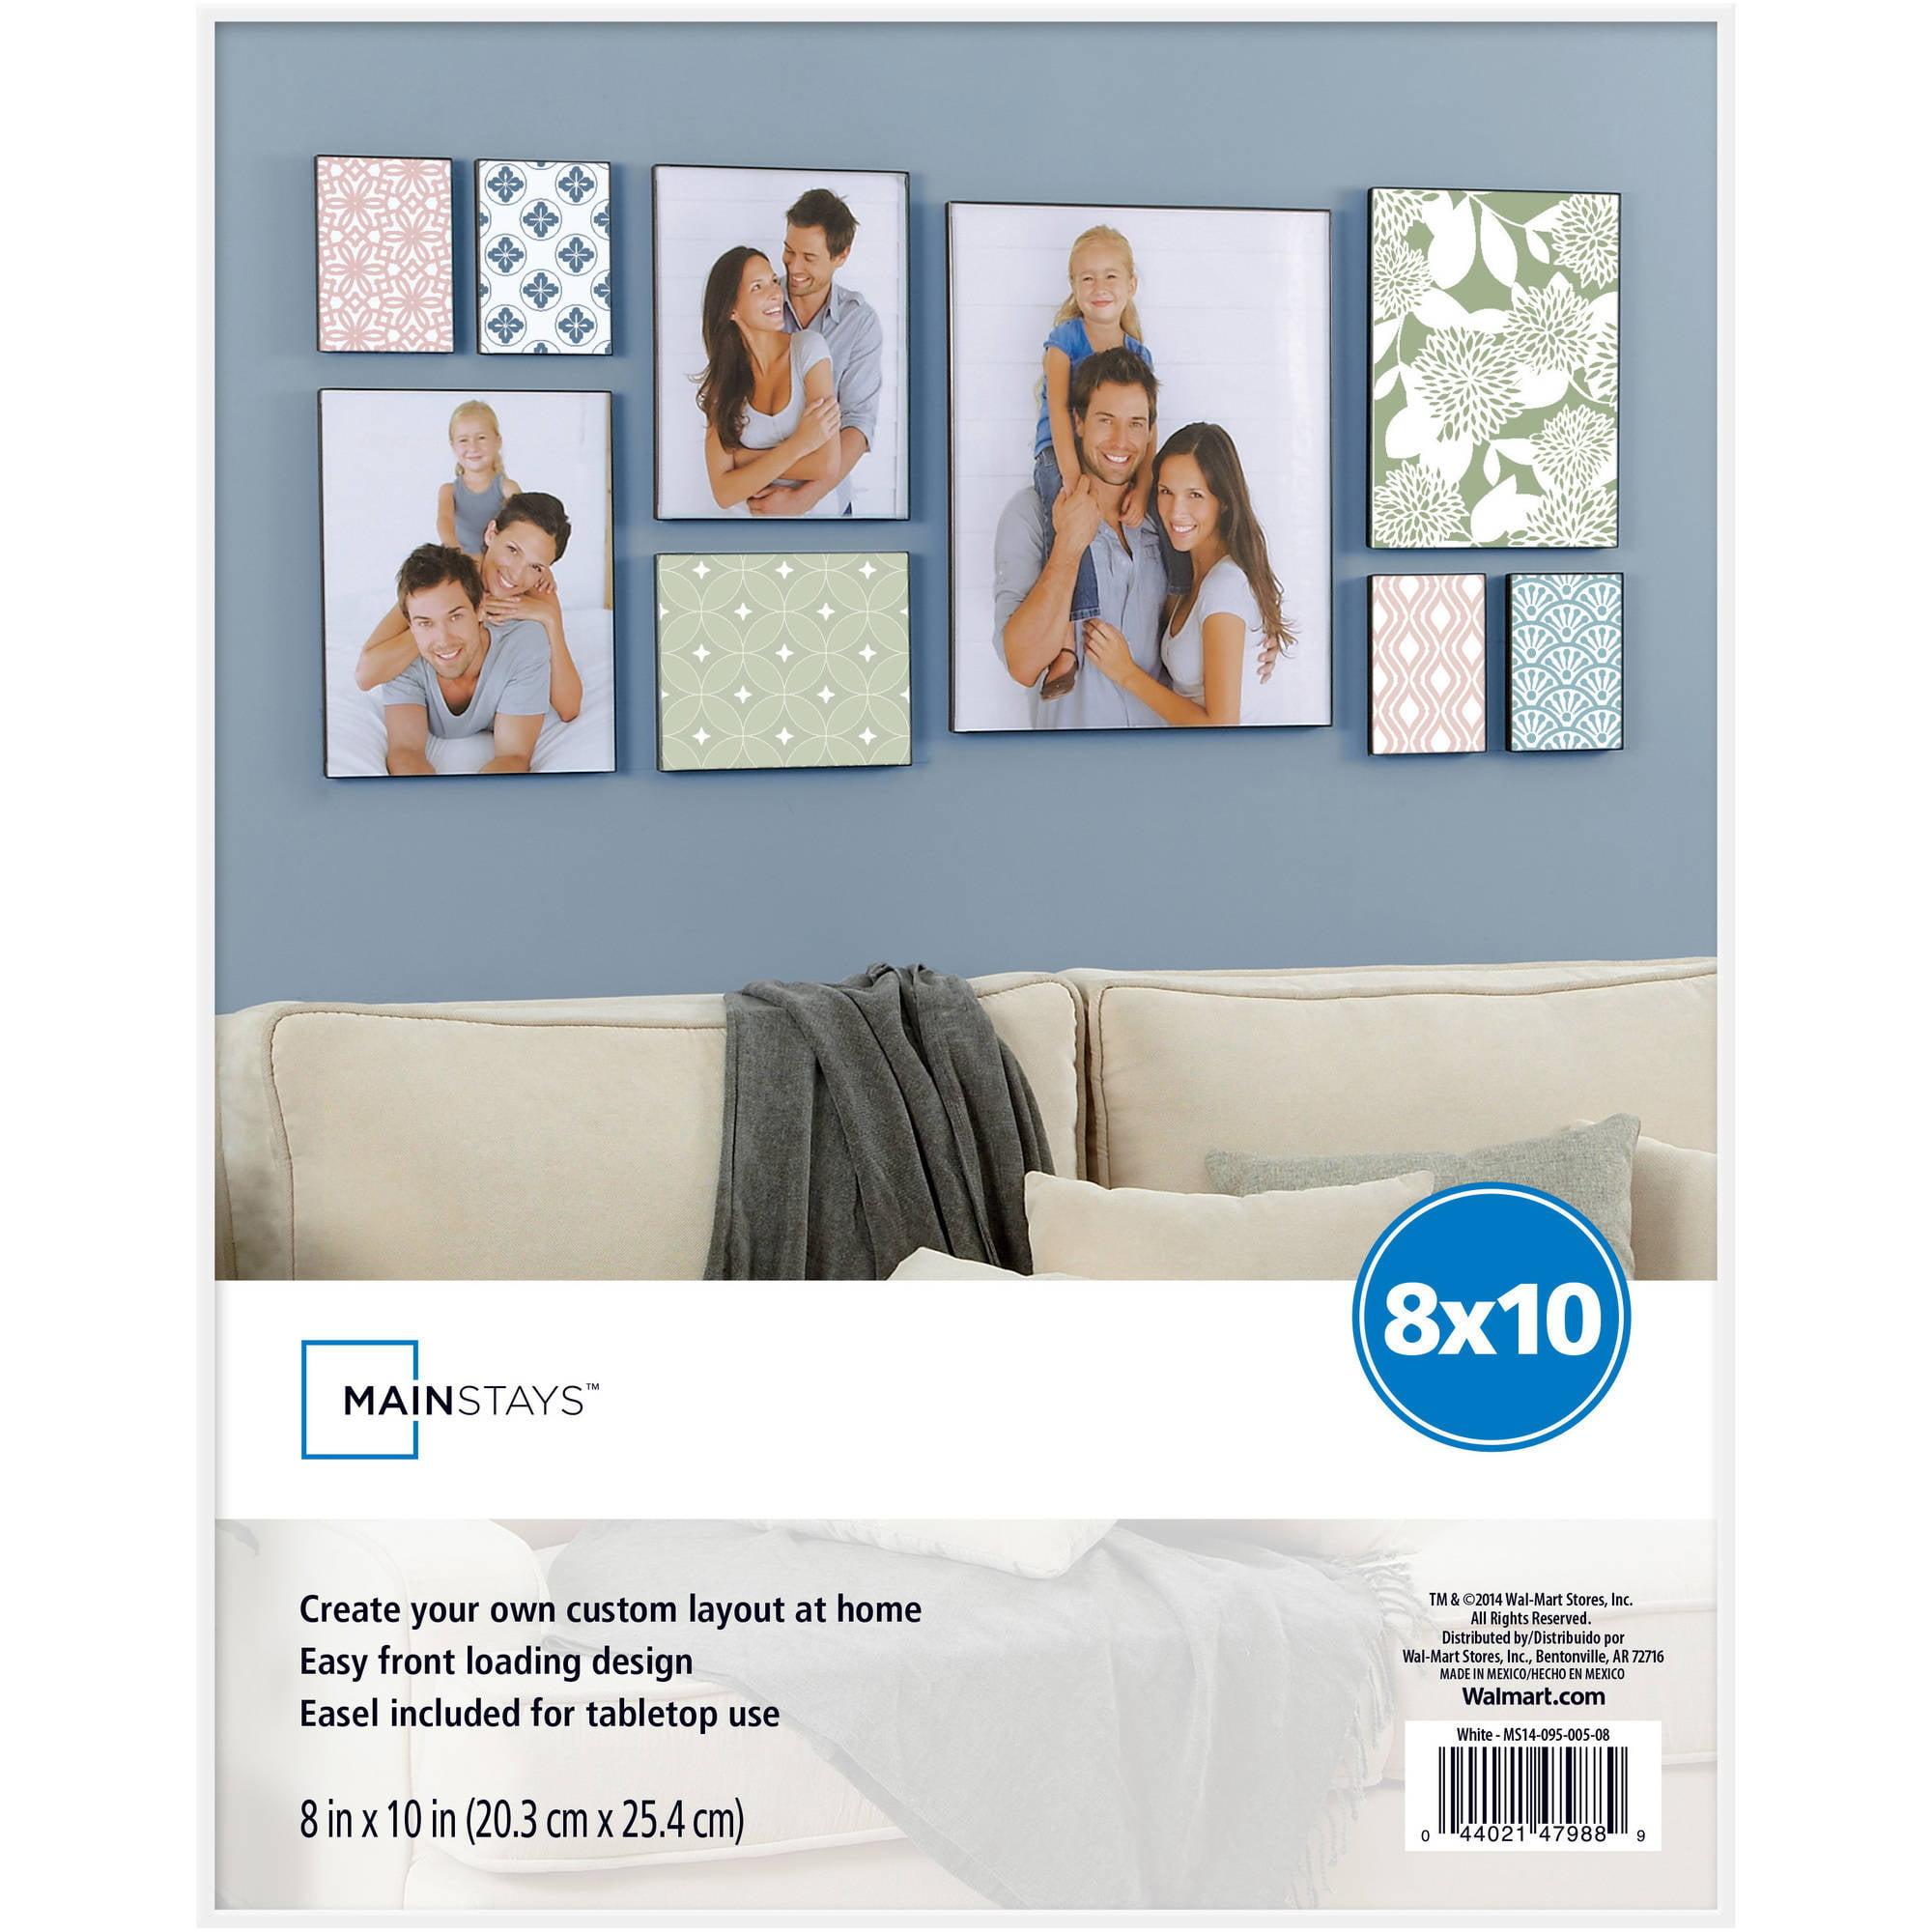 Mainstays 8x10 White Format Frame Walmartcom